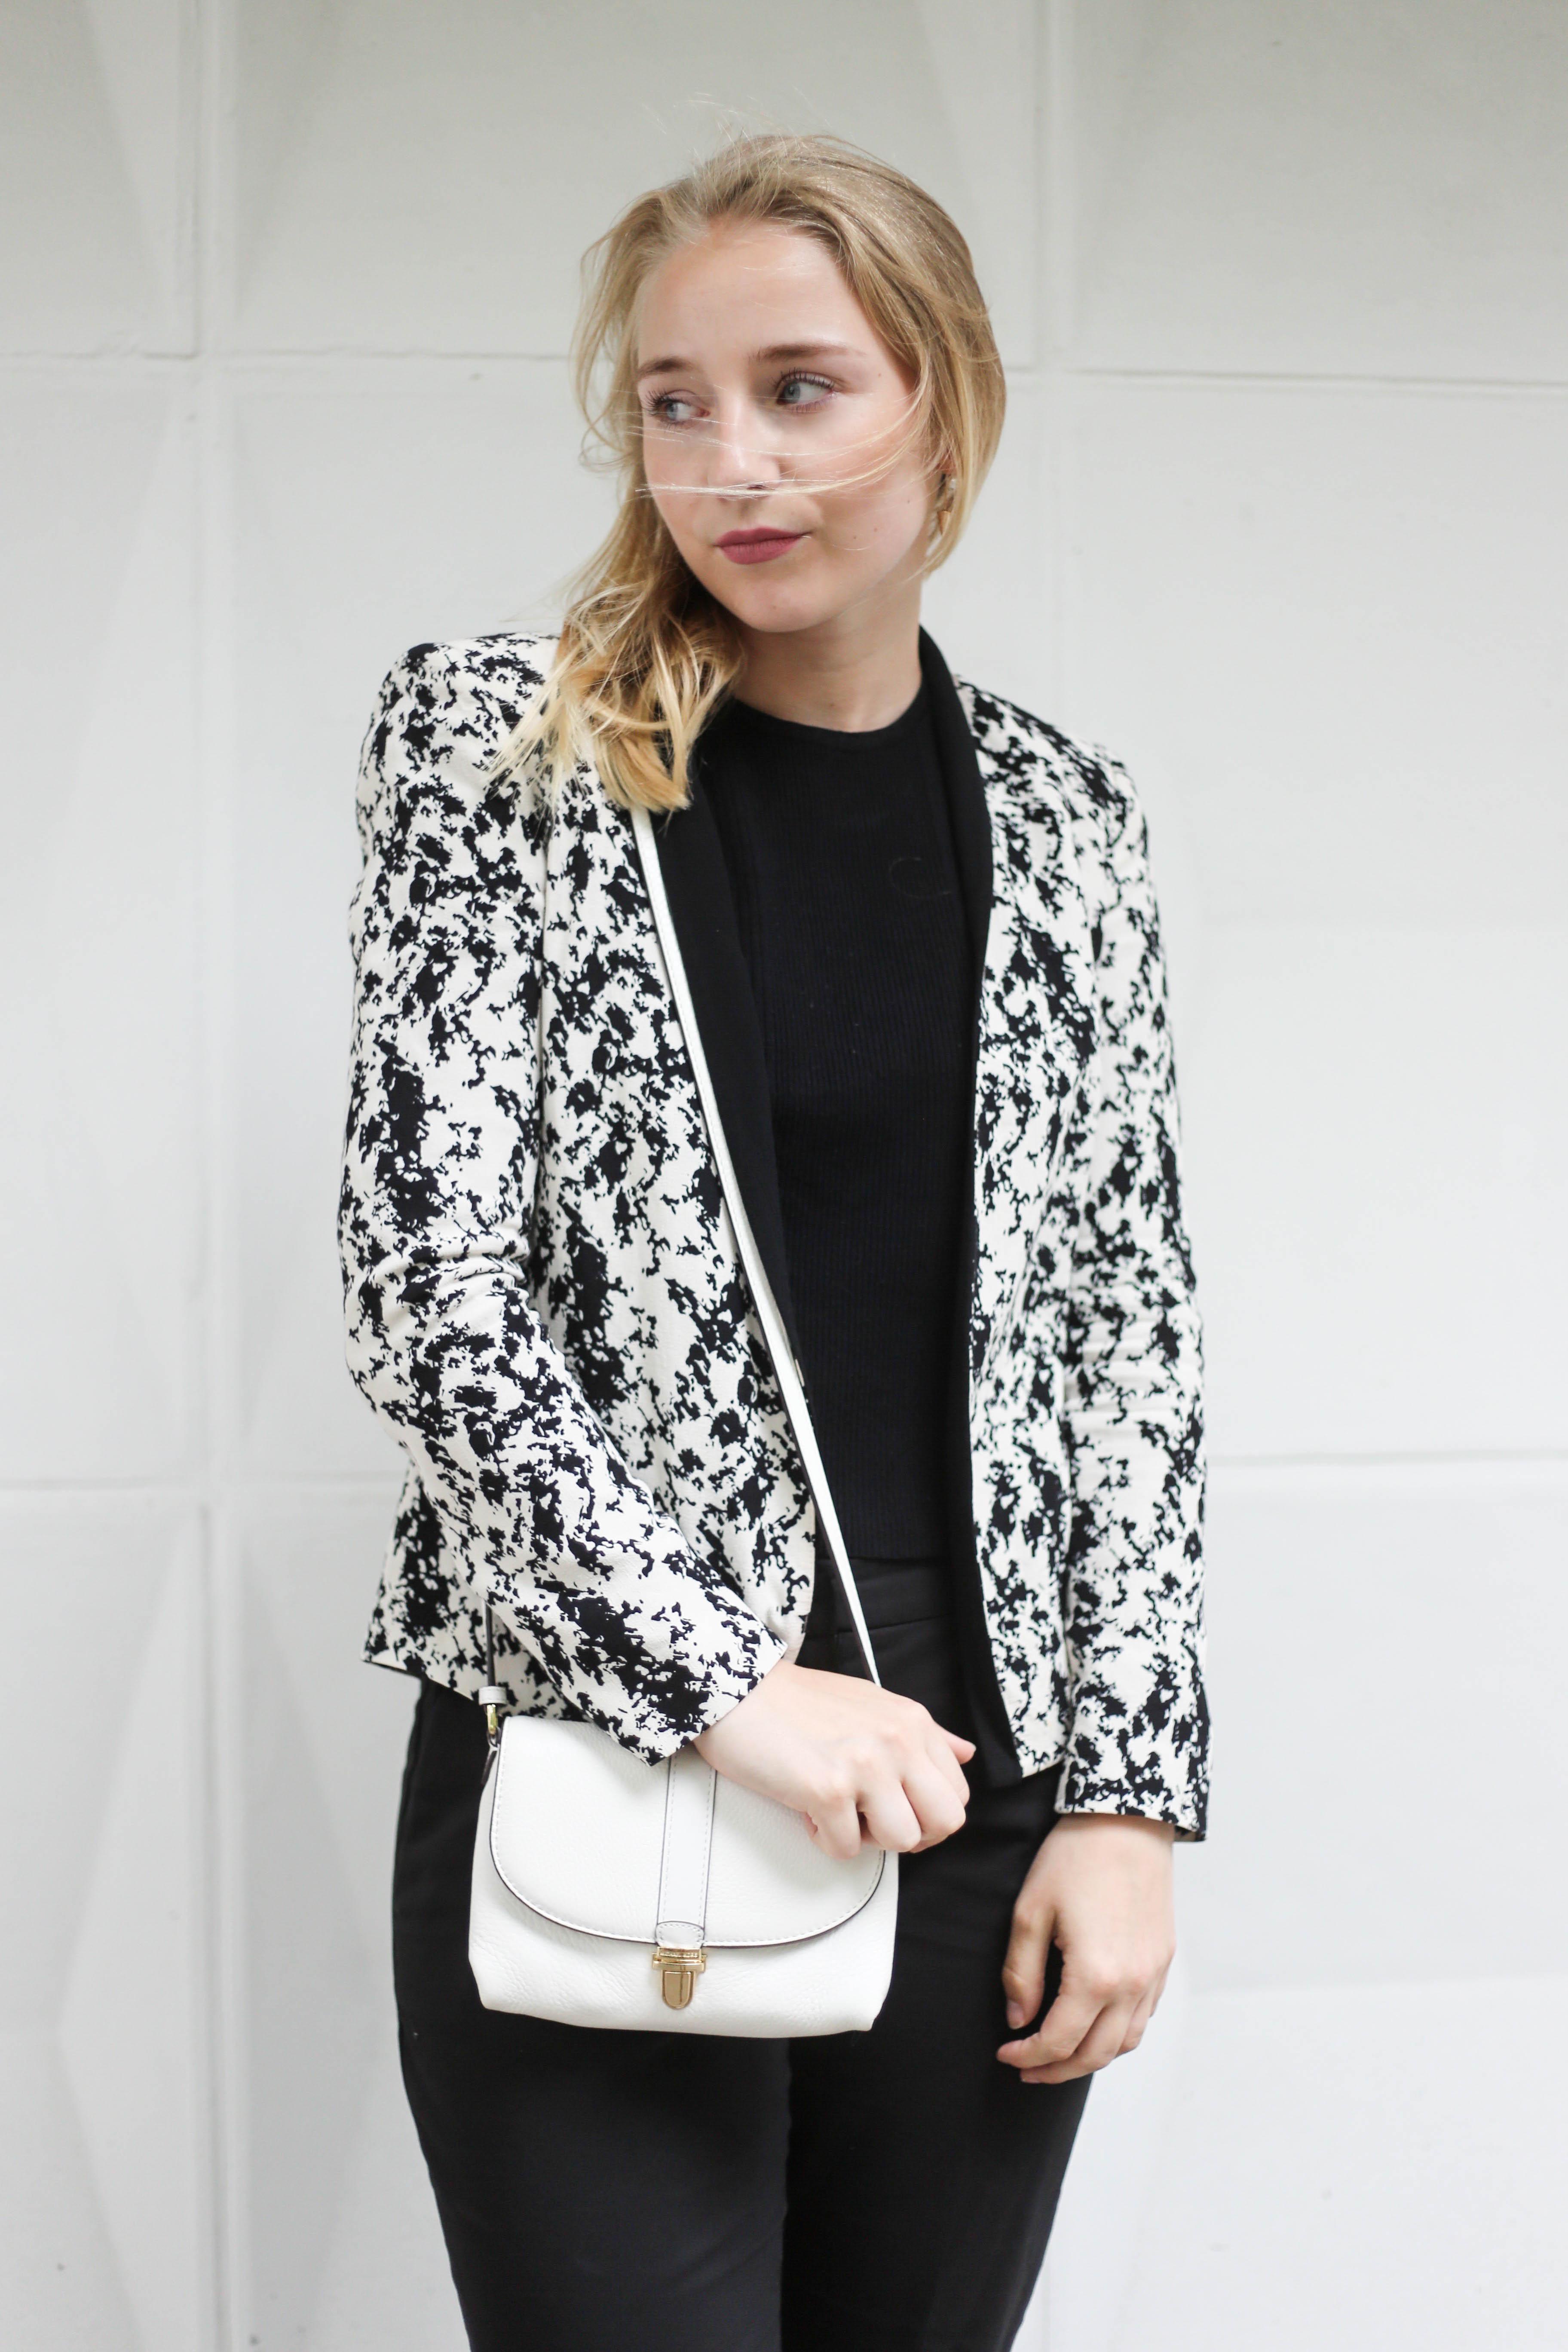 anzugshose-alltag-dalmatiner-blazer-outfit-fashionblog-berlin-köln_2140